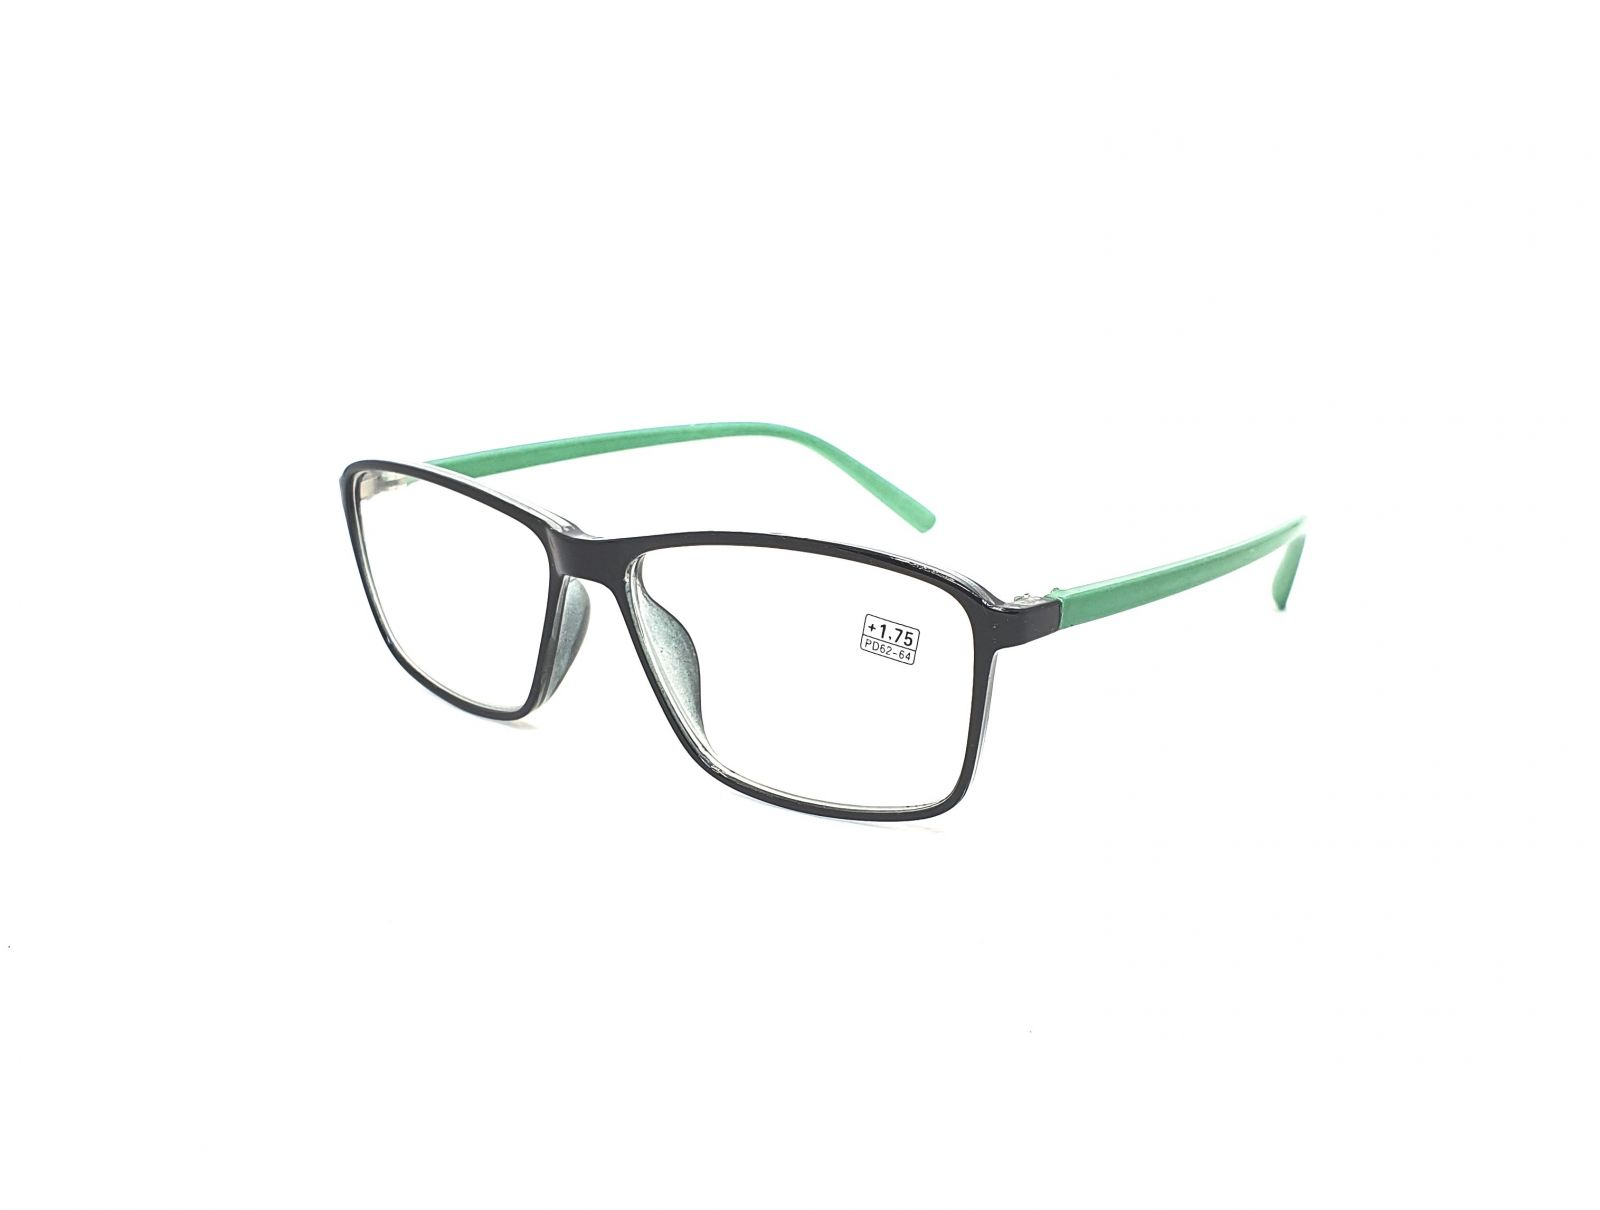 Dioptrické brýle 17218 / +1,75 green